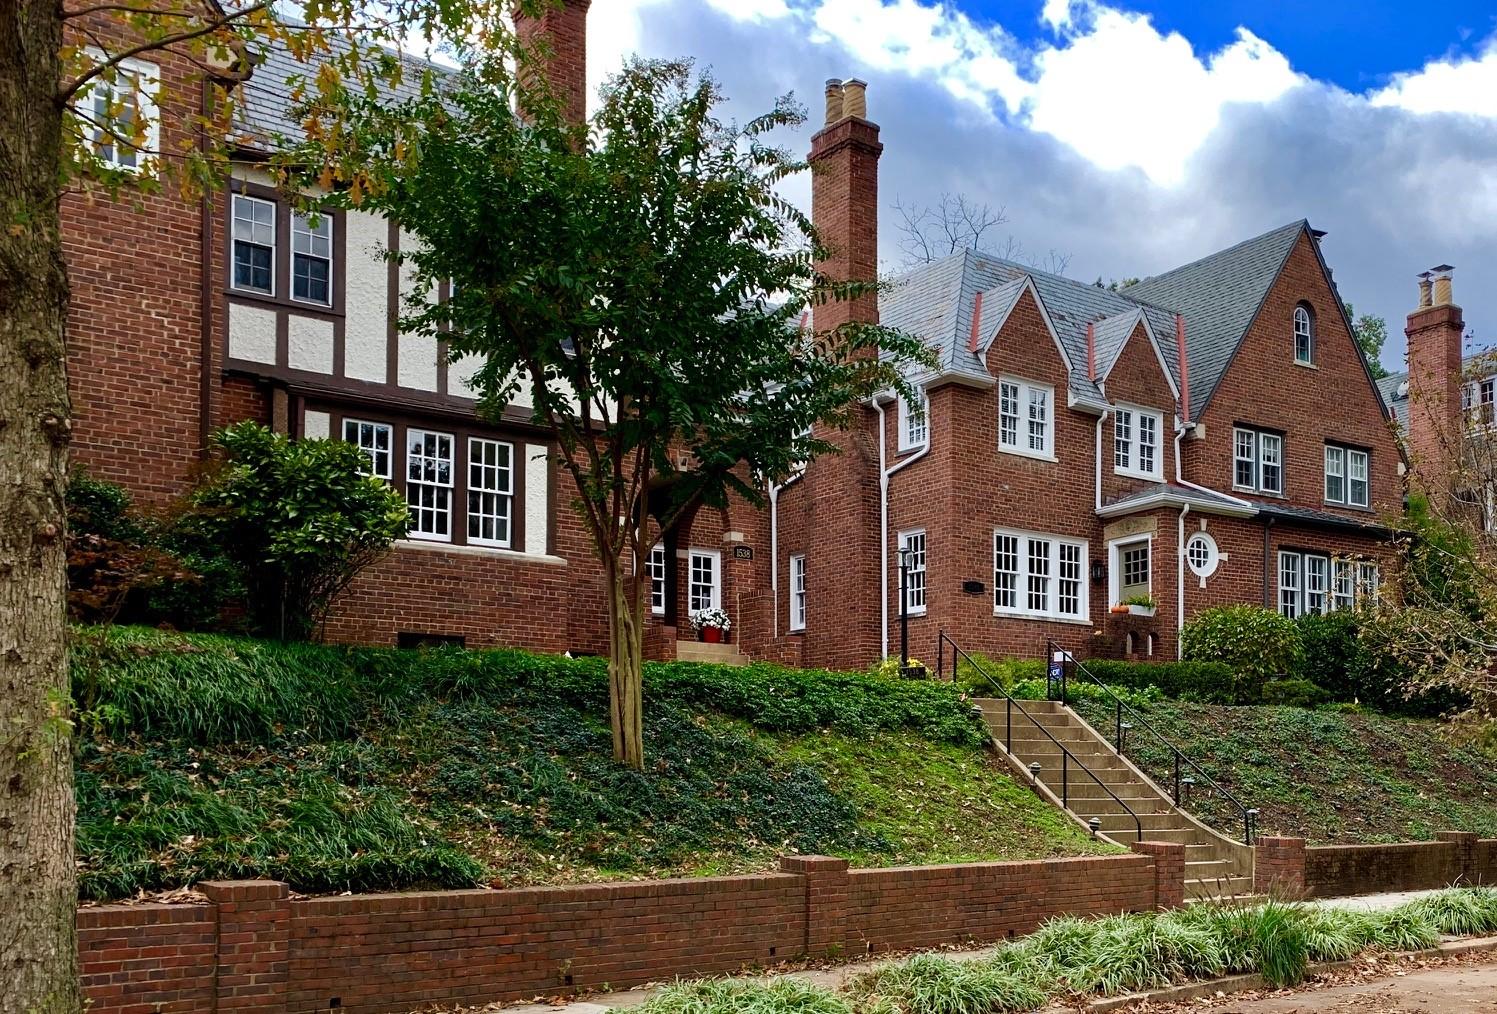 Washington, DC Townhomes For Sale. Foxhall Village. Artyom Shmatko Luxury Real Estate Agent